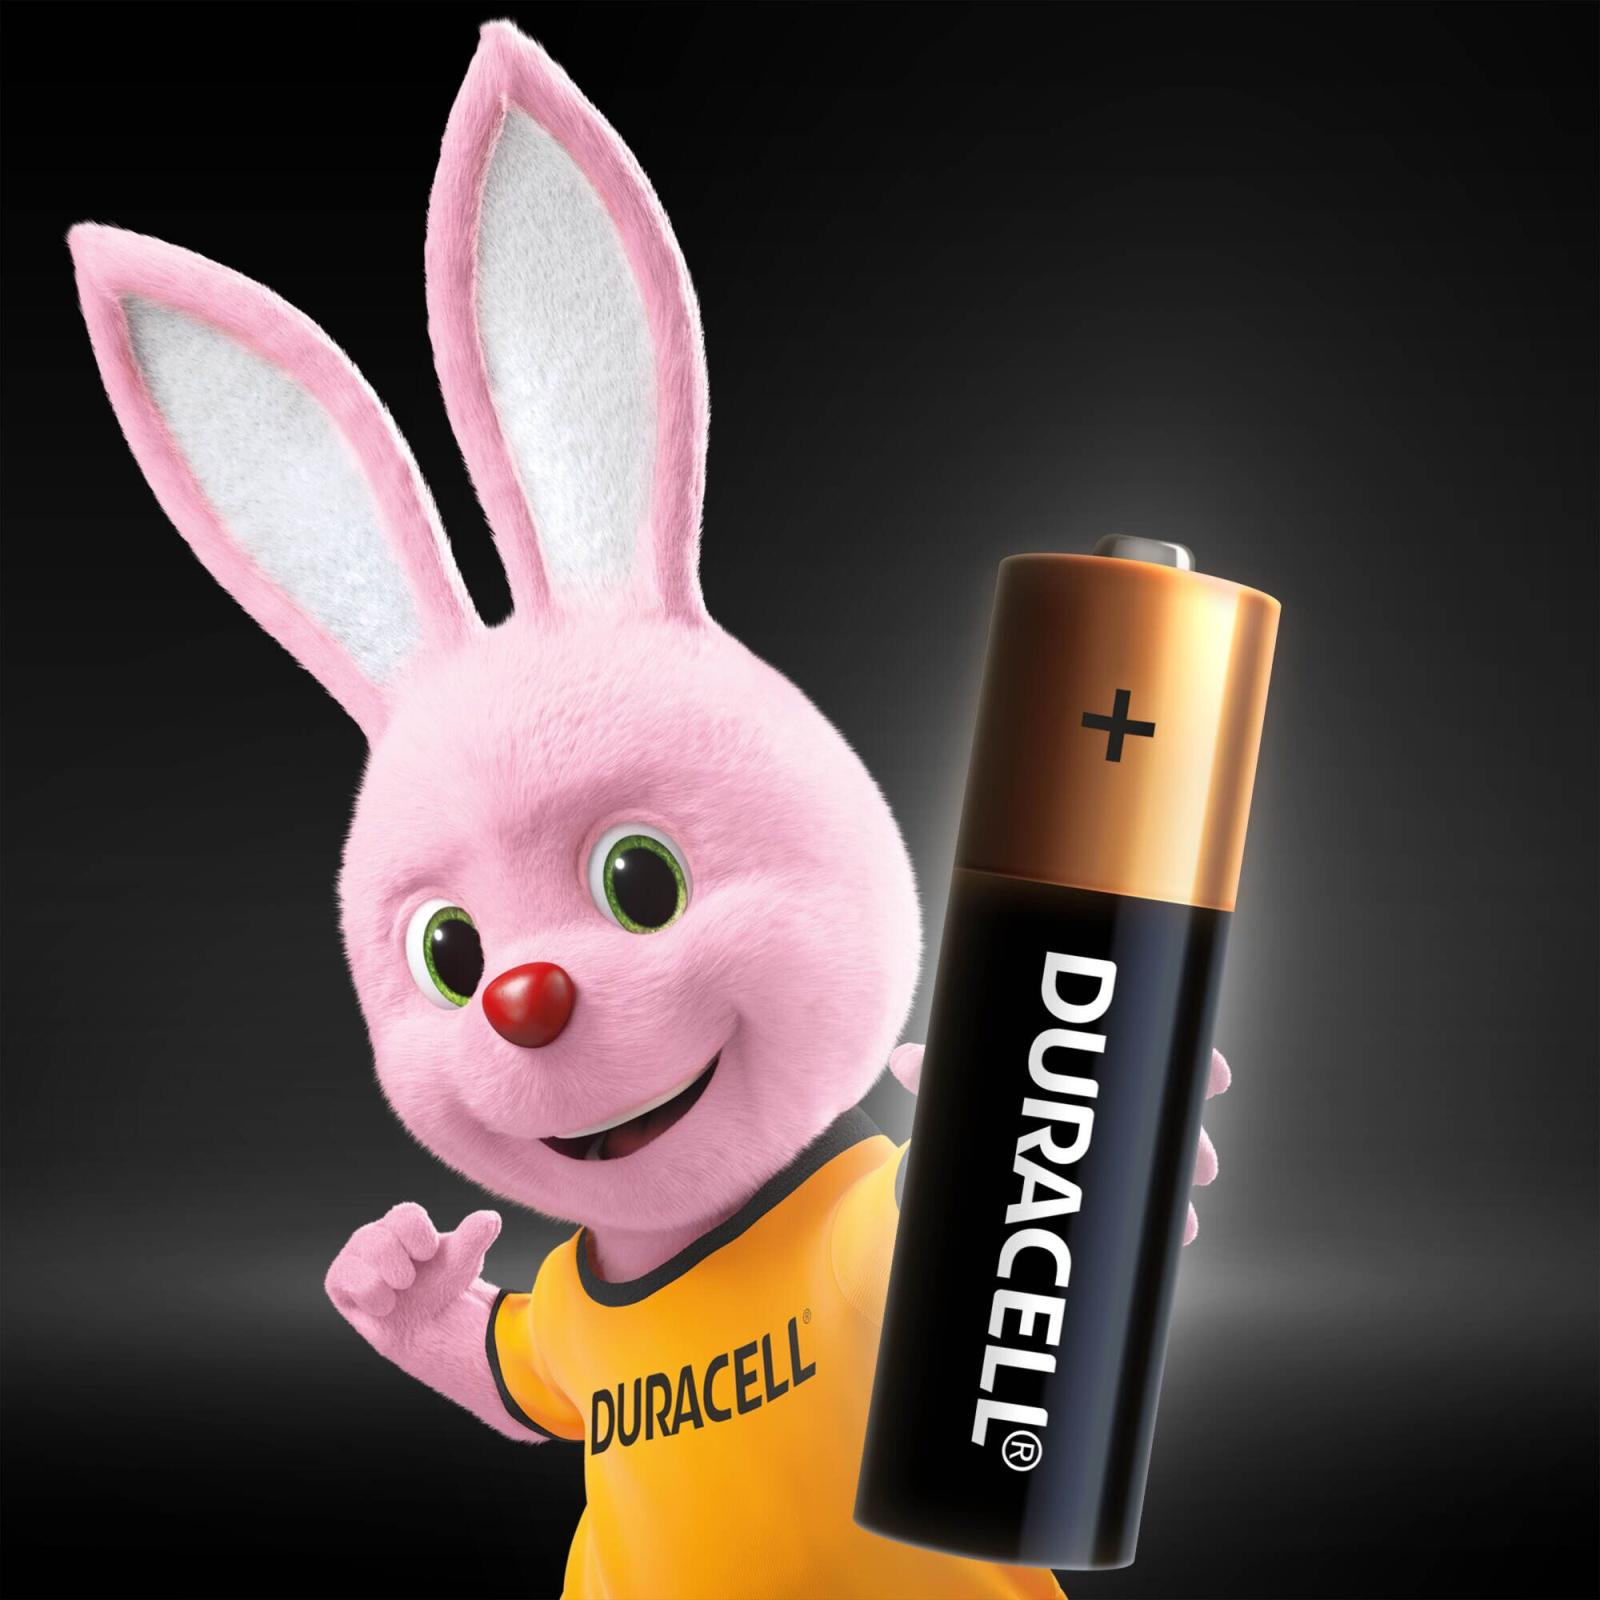 Батарейка Duracell AA MN1500 LR06 * 4 (5000394052536 / 81551270) изображение 3